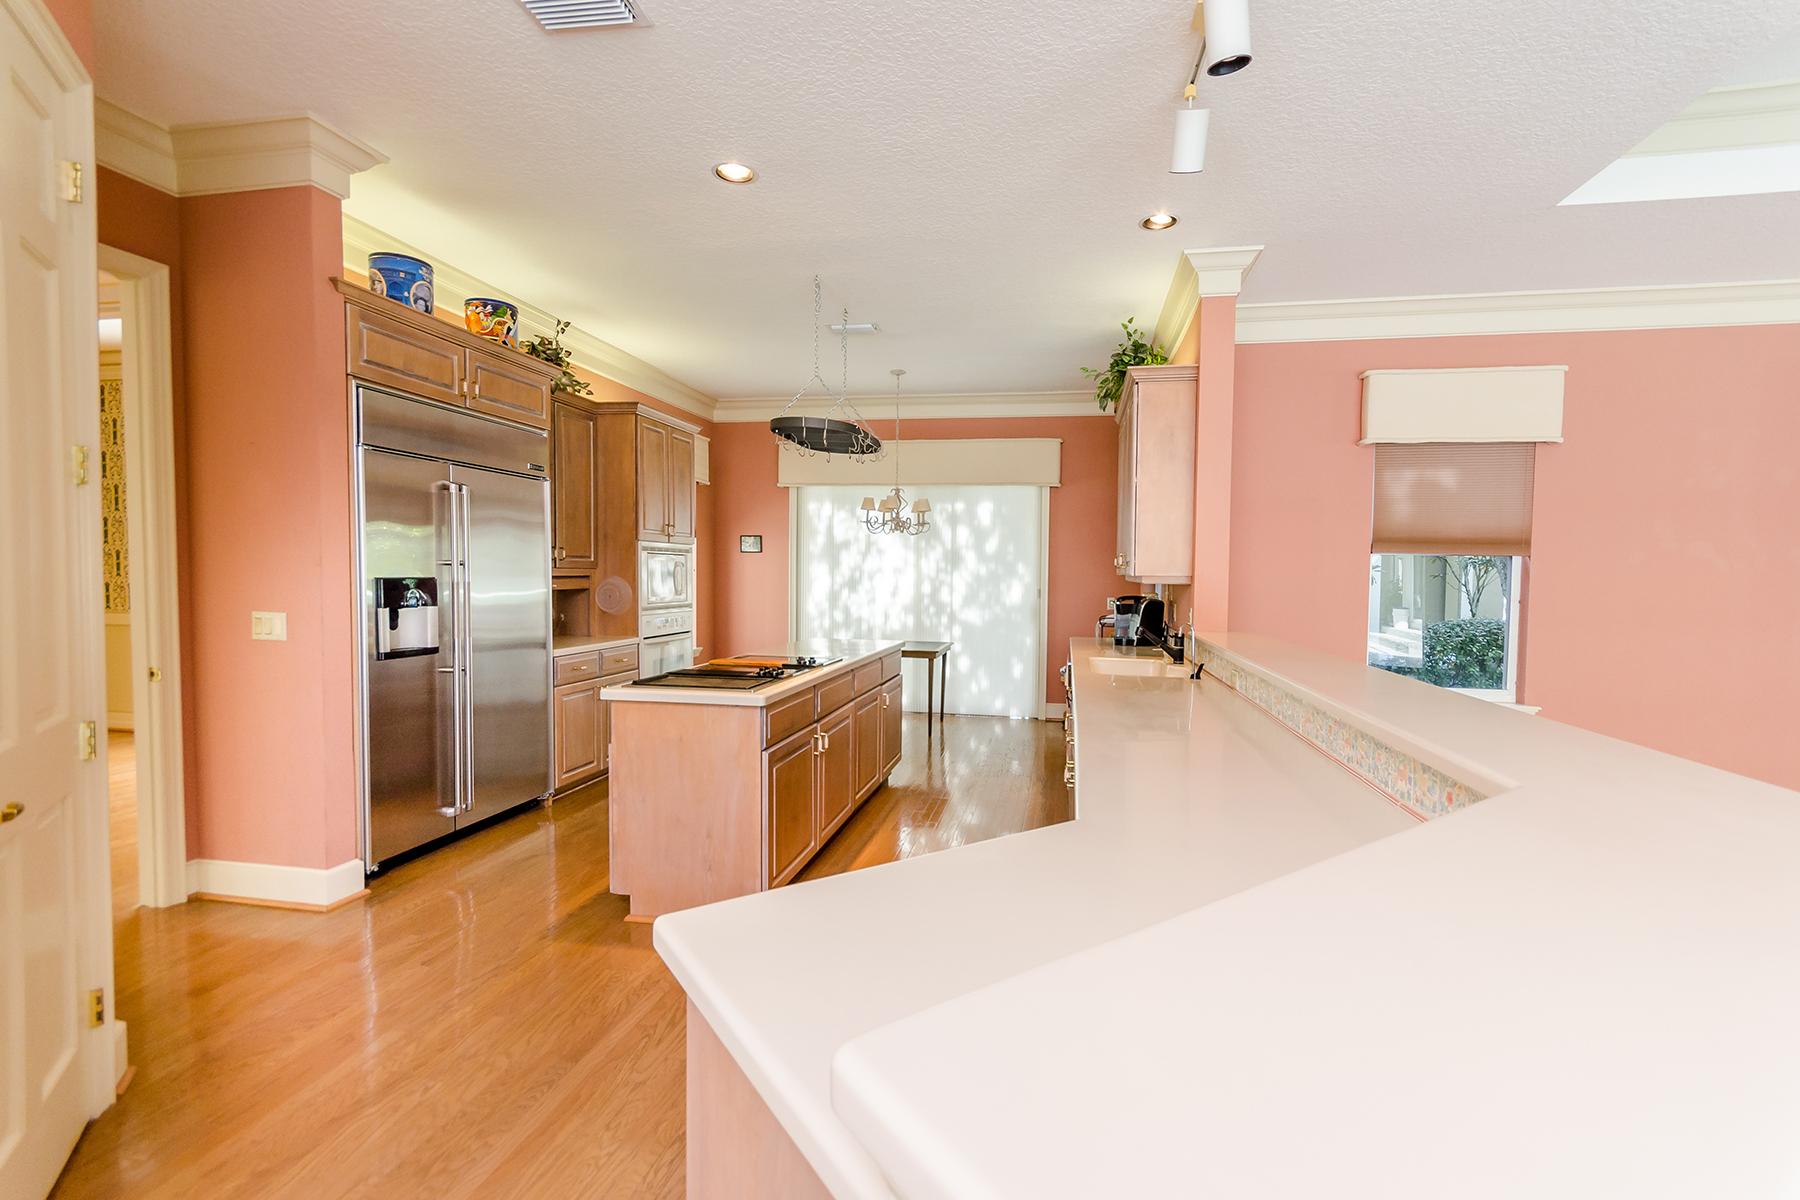 Additional photo for property listing at ORLANDO 9220  Cromwell Gardens Ct,  Orlando, Florida 32827 United States